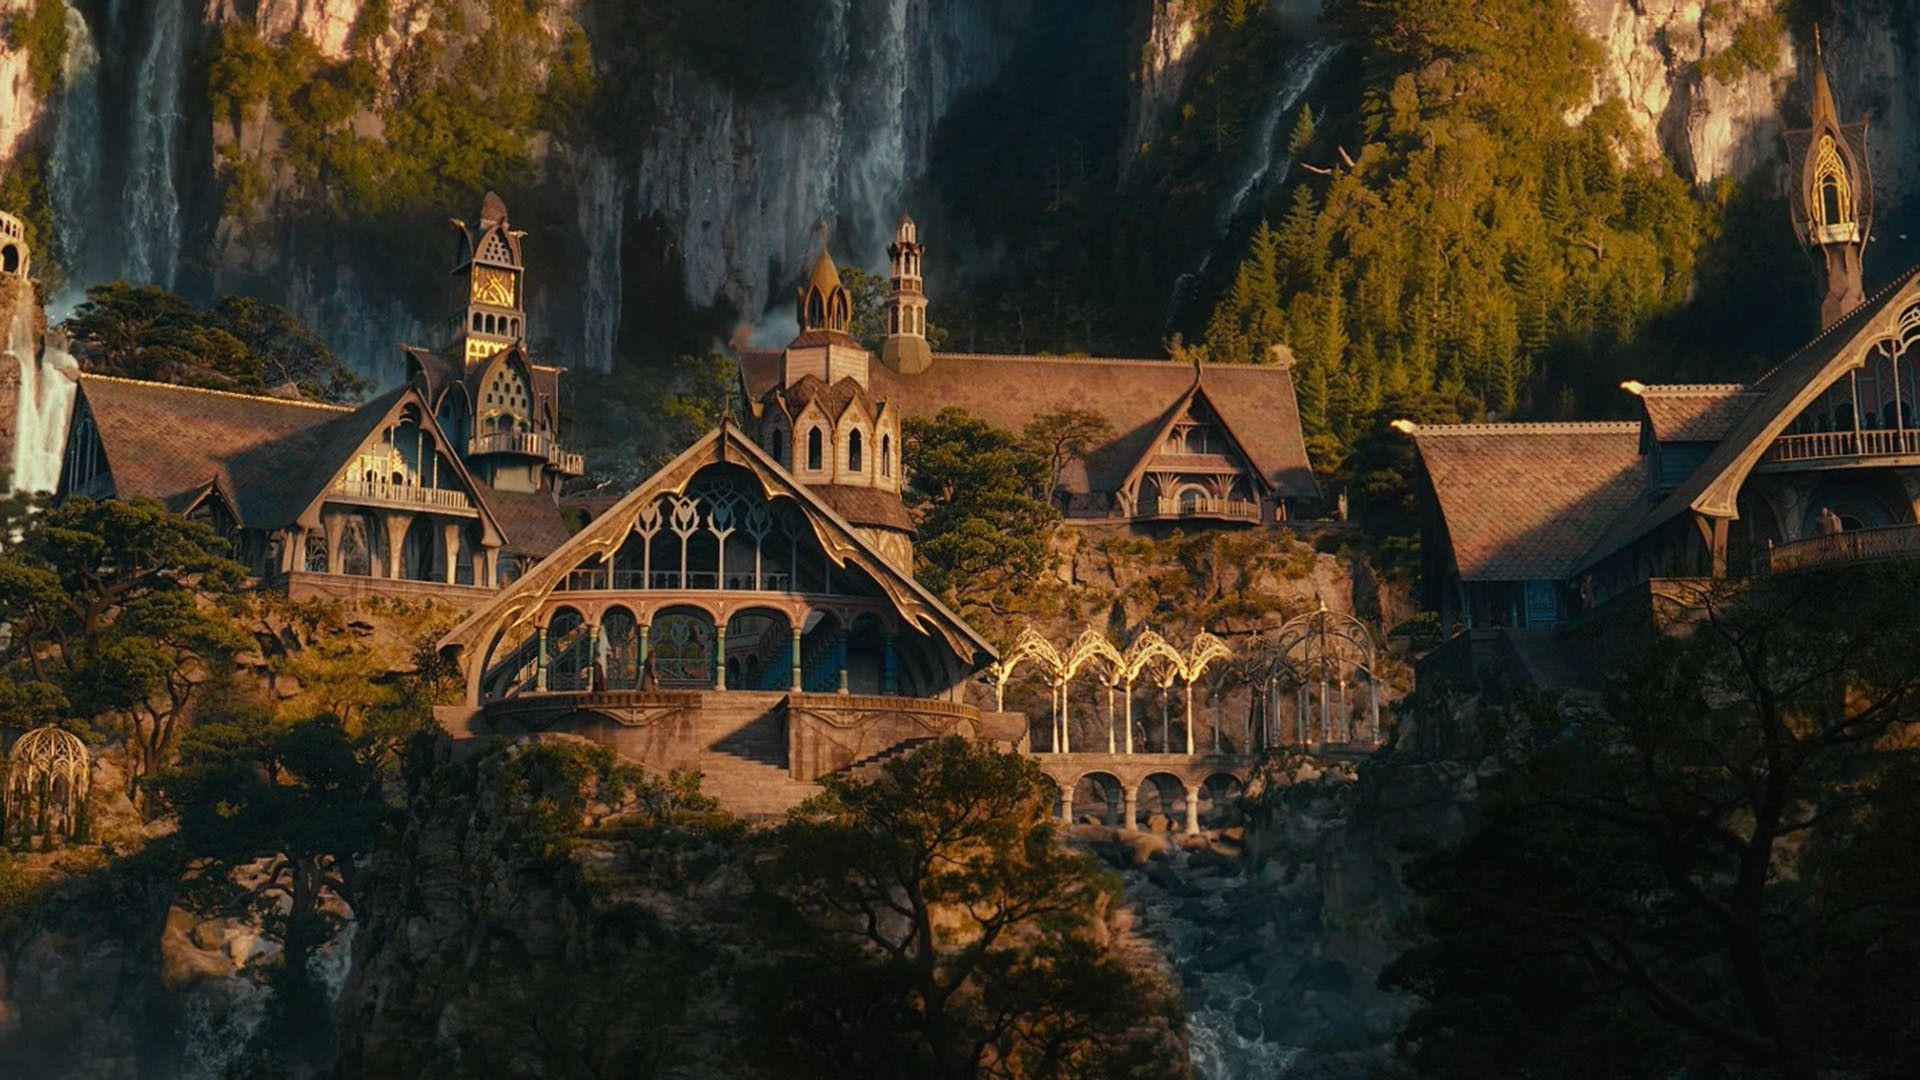 70 Lord Of The Rings Hd Wallpaper On Wallpapersafari